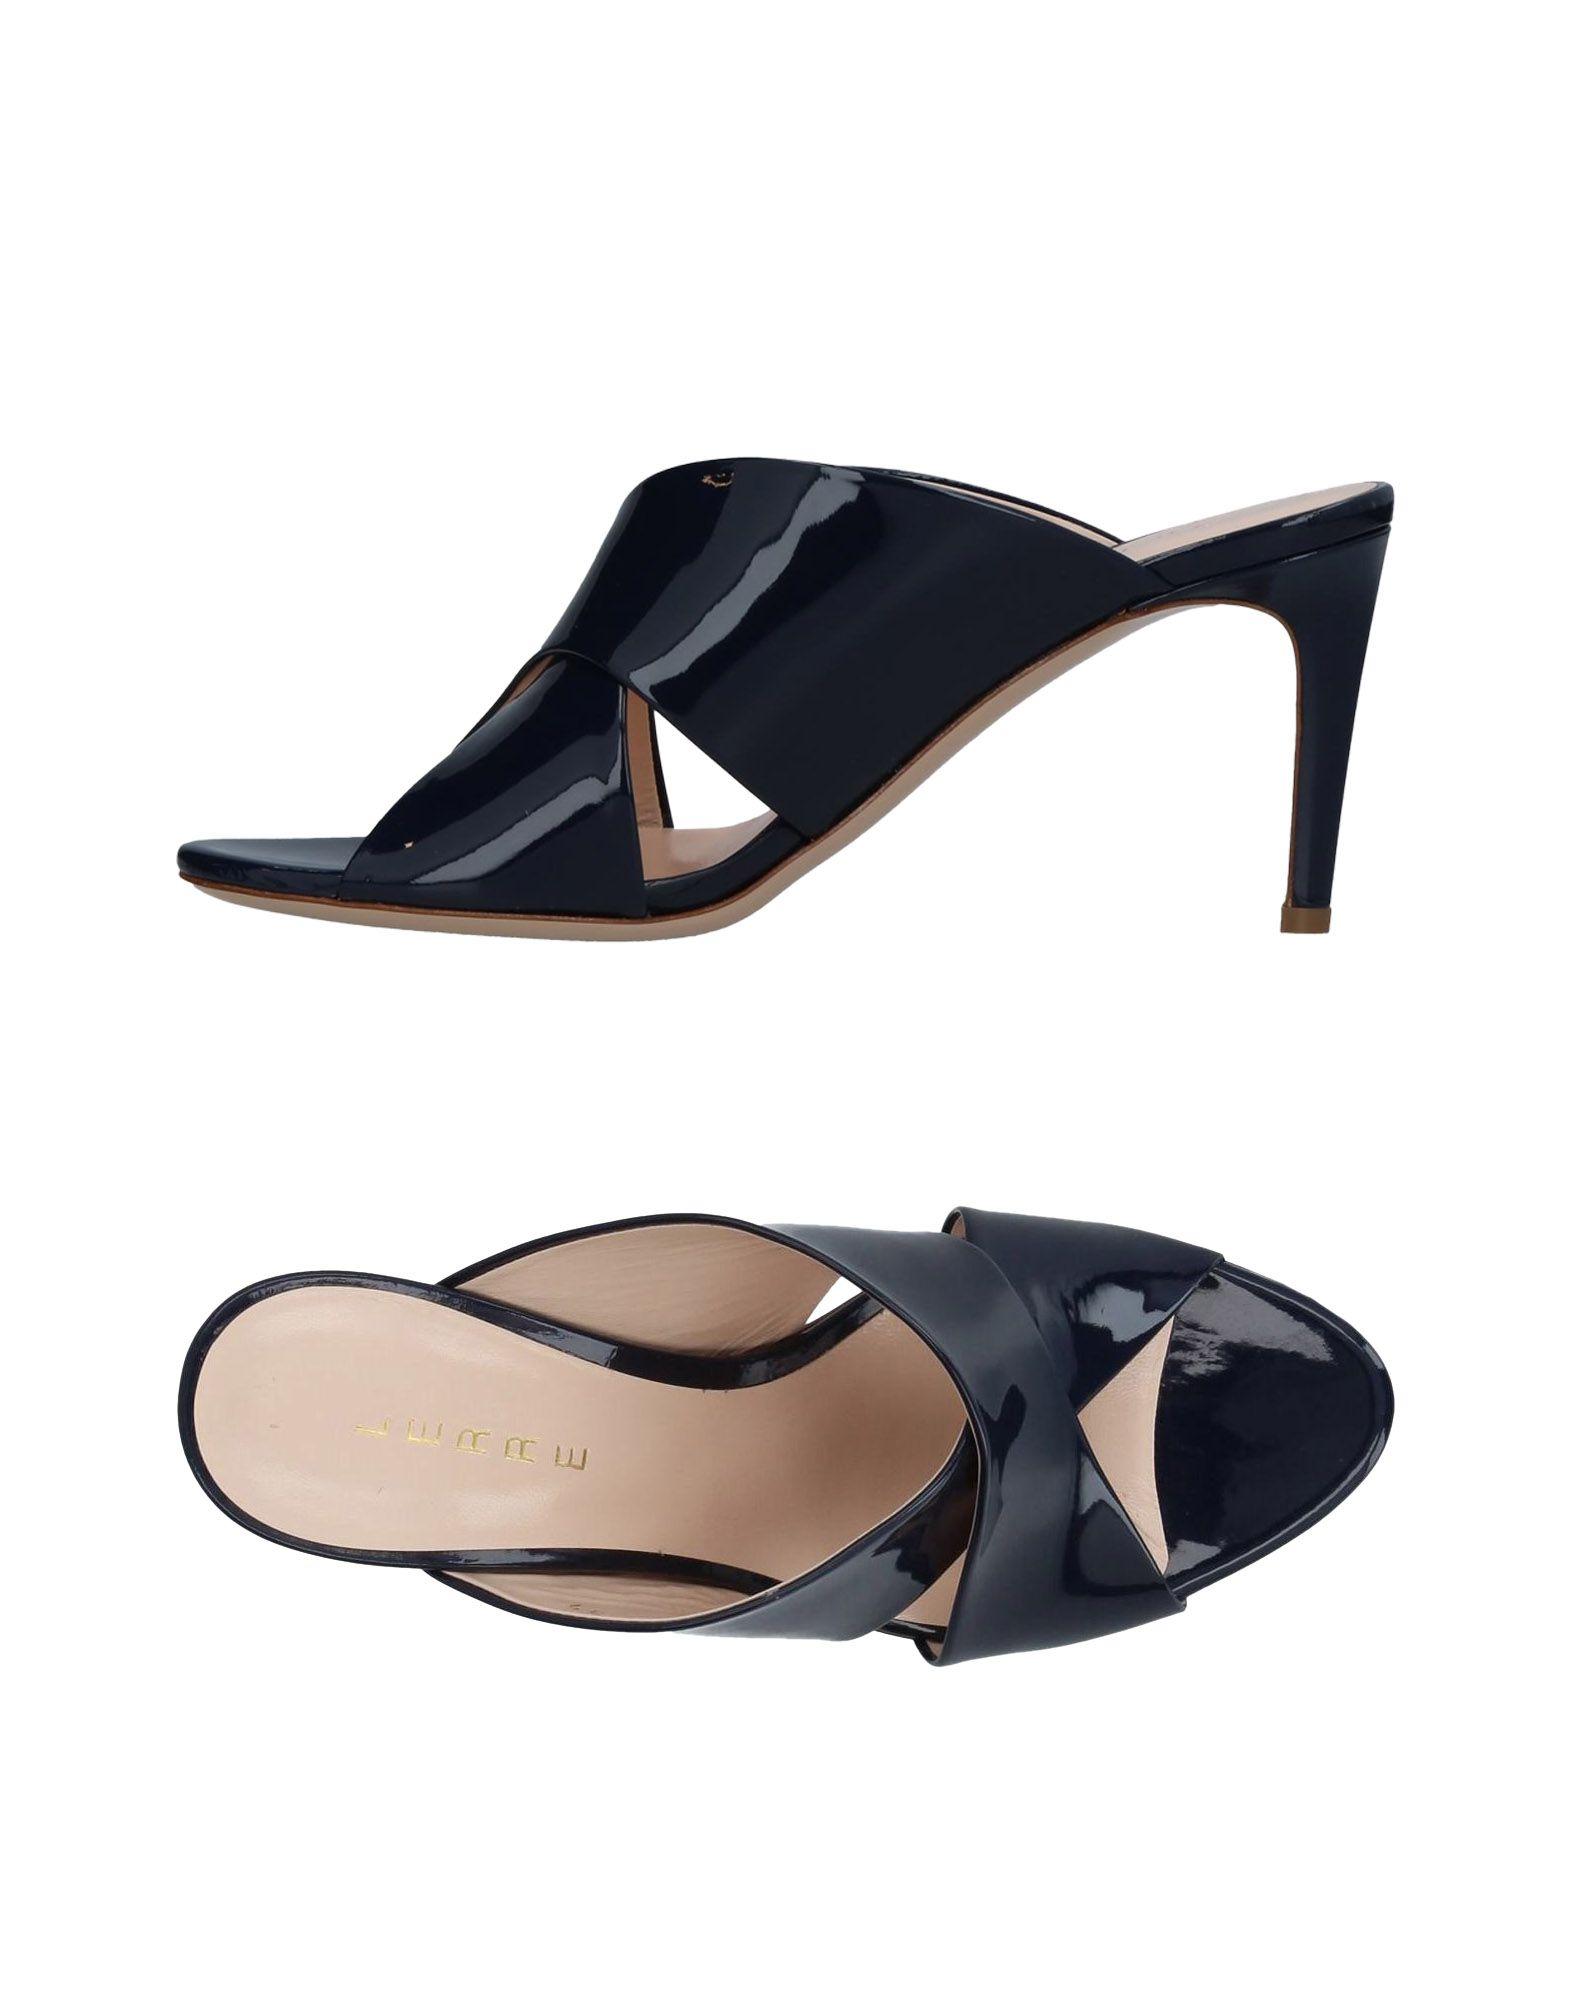 Stilvolle billige Schuhe Damen Lerre Sandalen Damen Schuhe  11377734TH 070fae